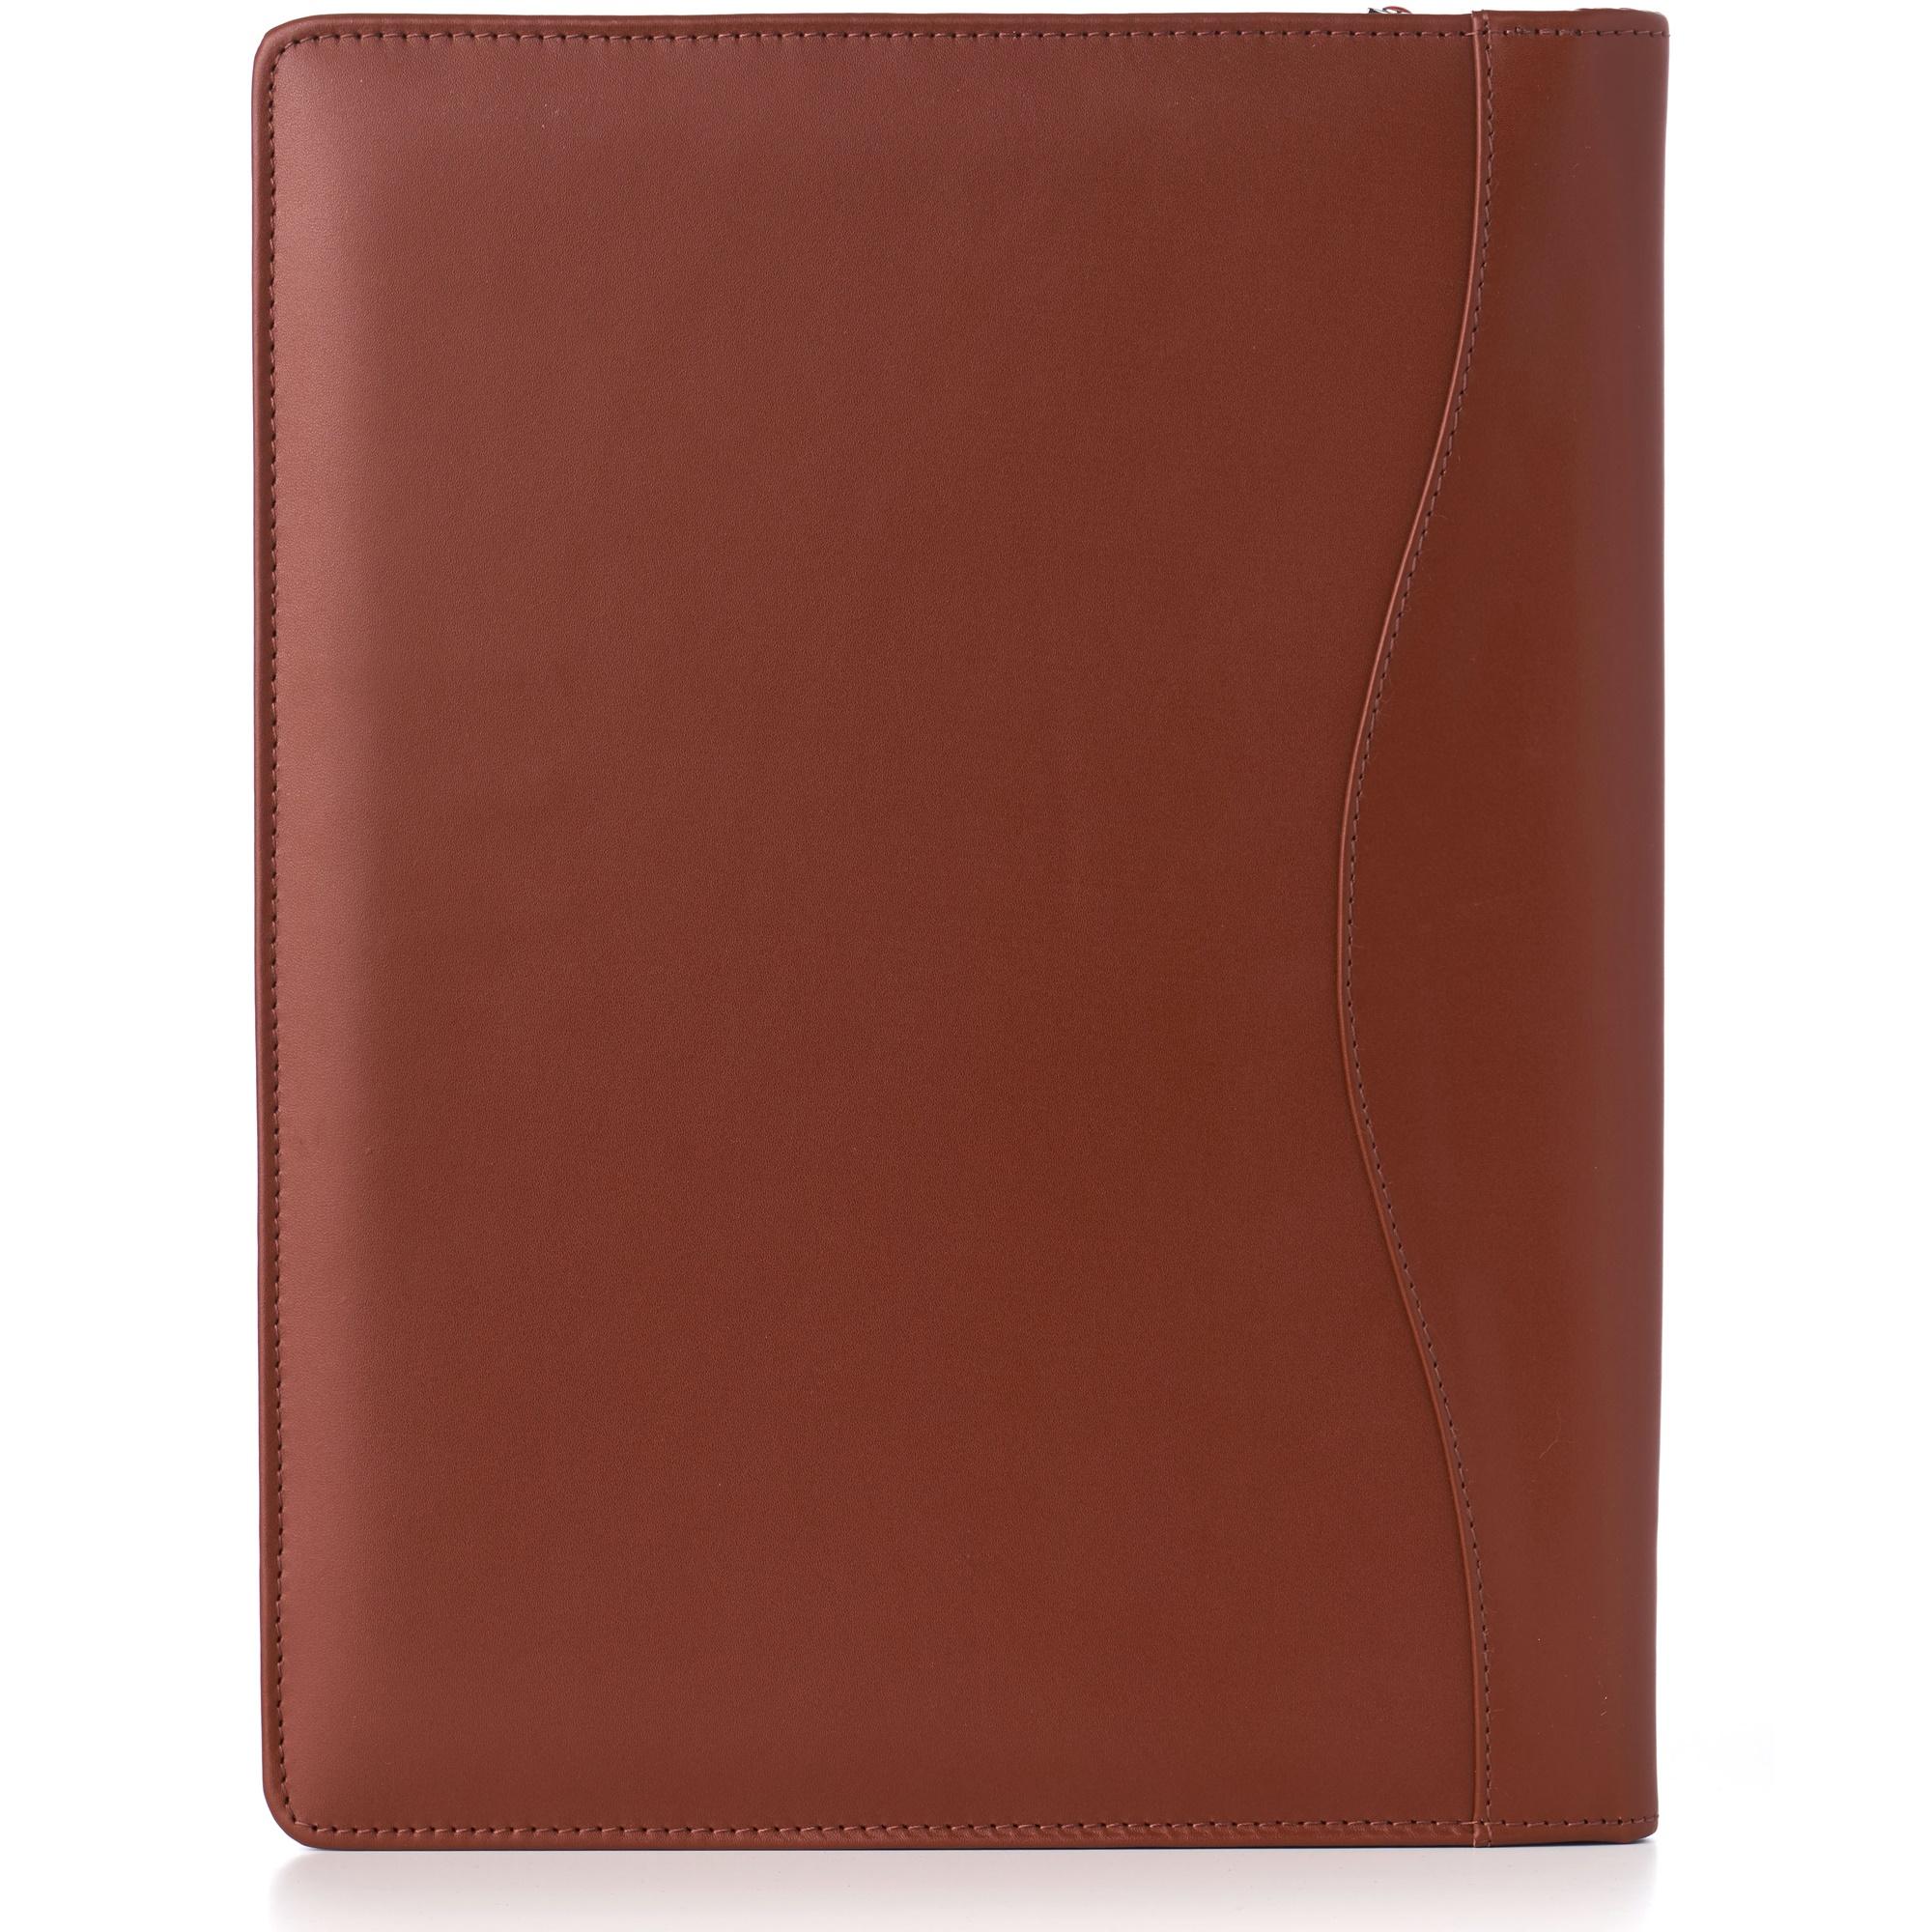 thumbnail 50 - Alpine Swiss Leather Zippered Writing Pad Portfolio Business Briefcase Organizer